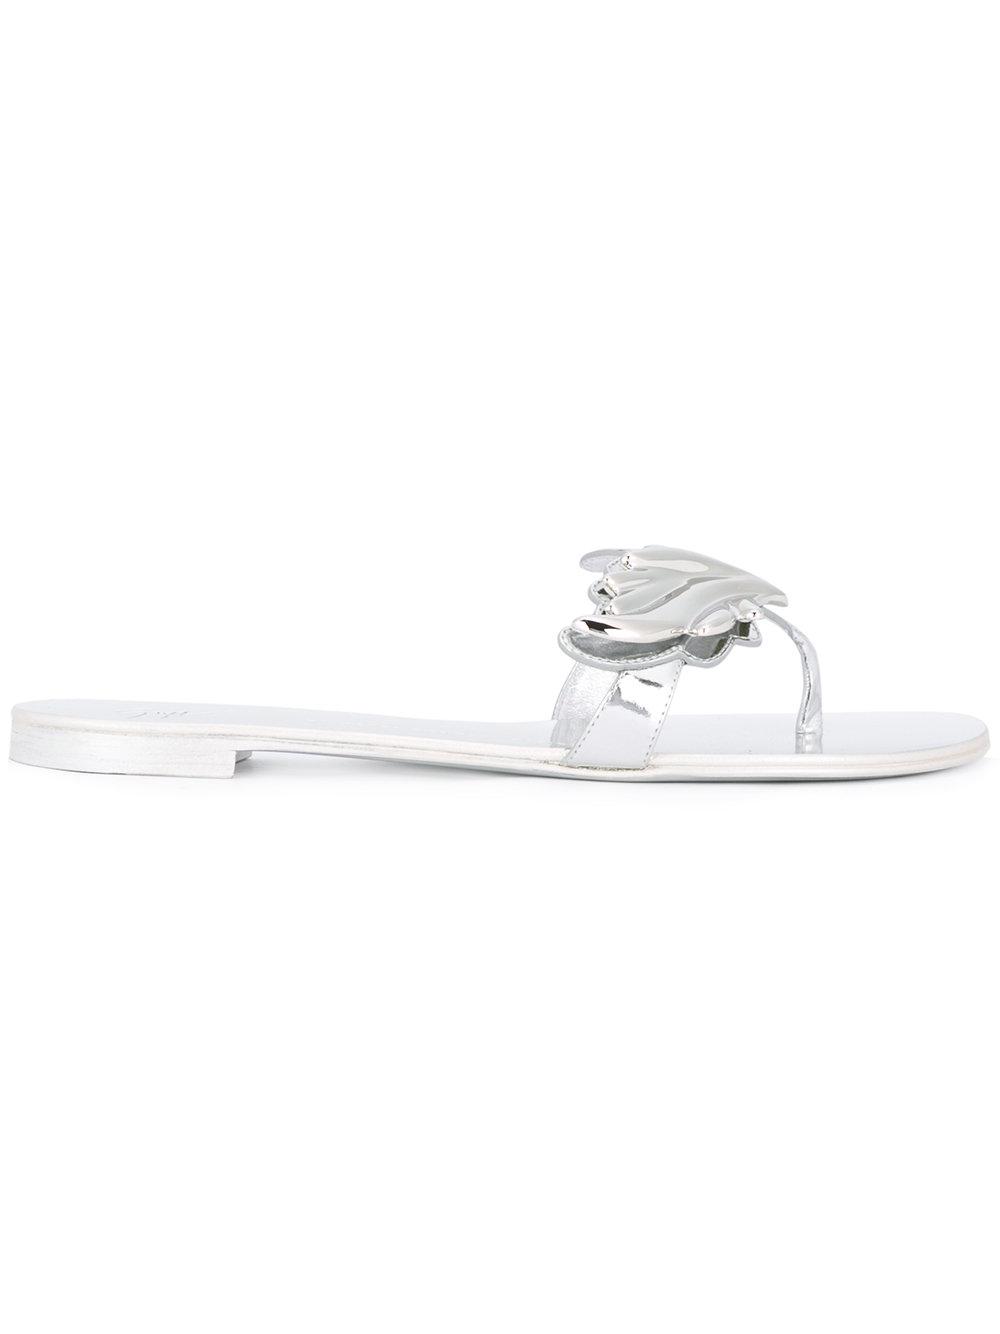 7973f08f983ee8 Giuseppe Zanotti Design Cruel Sandals